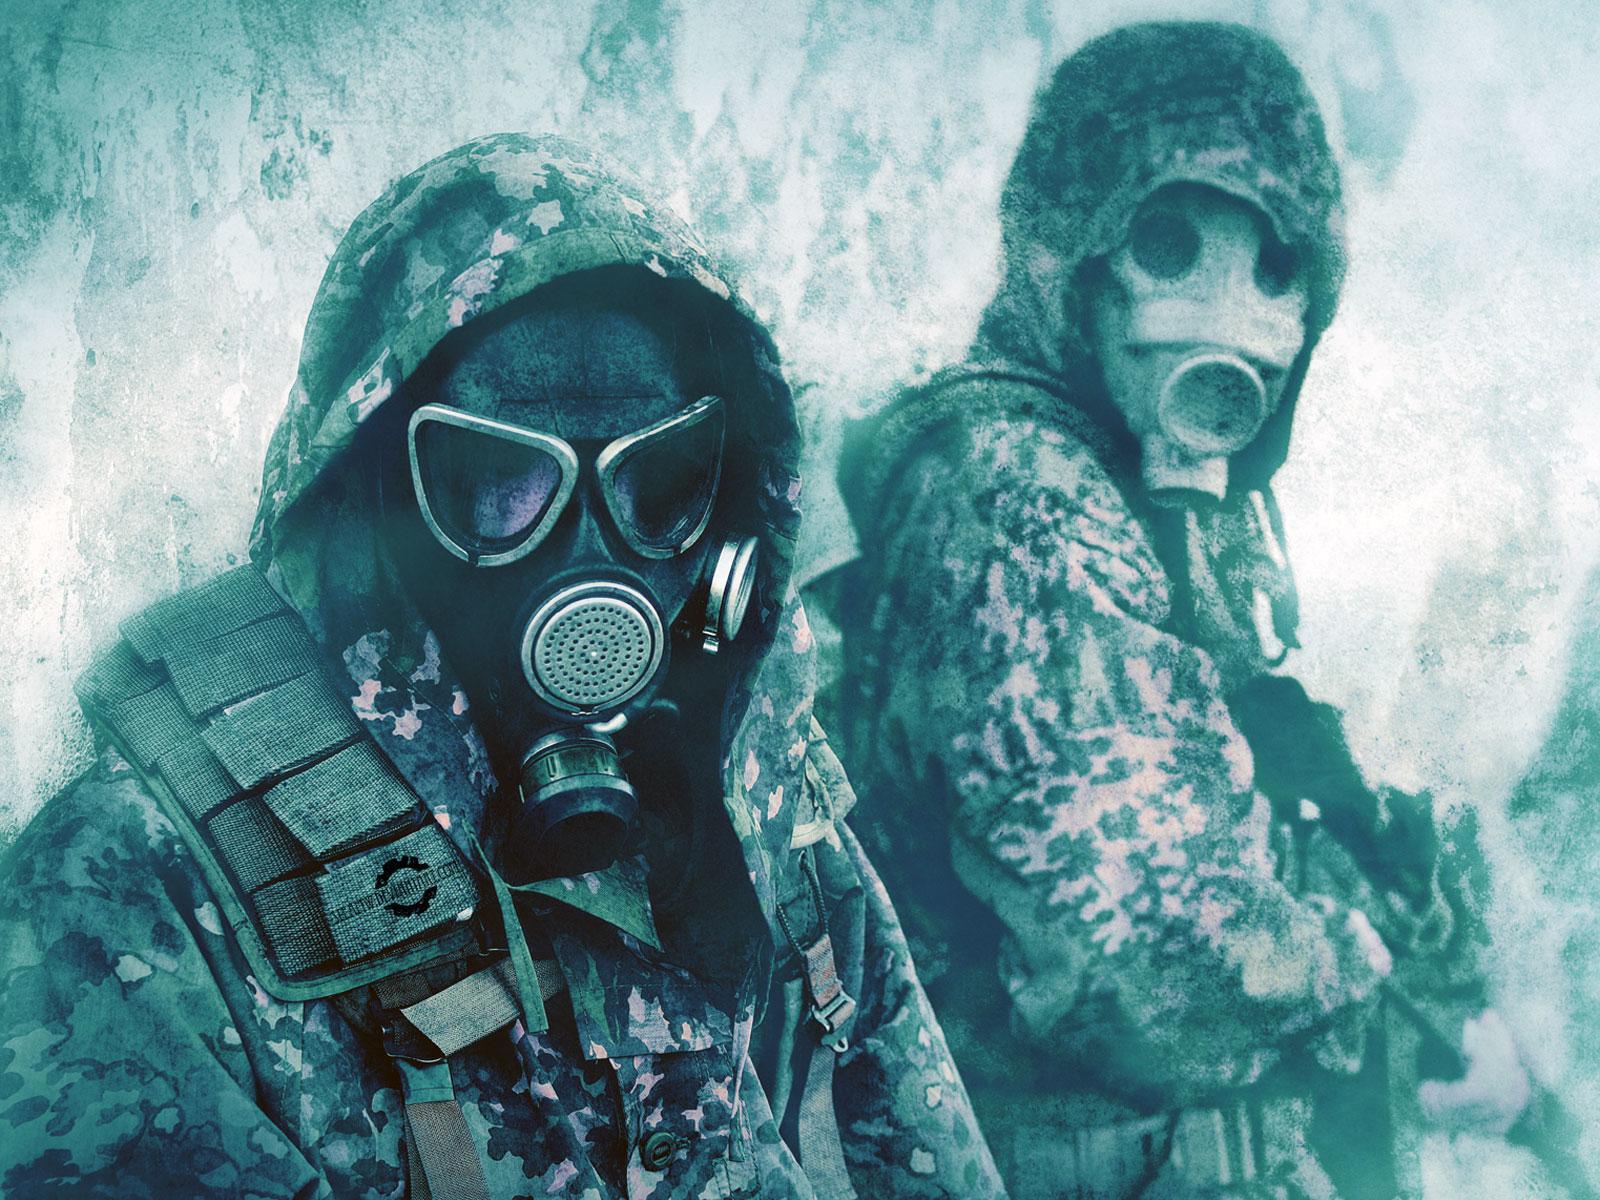 Gas Mask Wallpaper HD Download